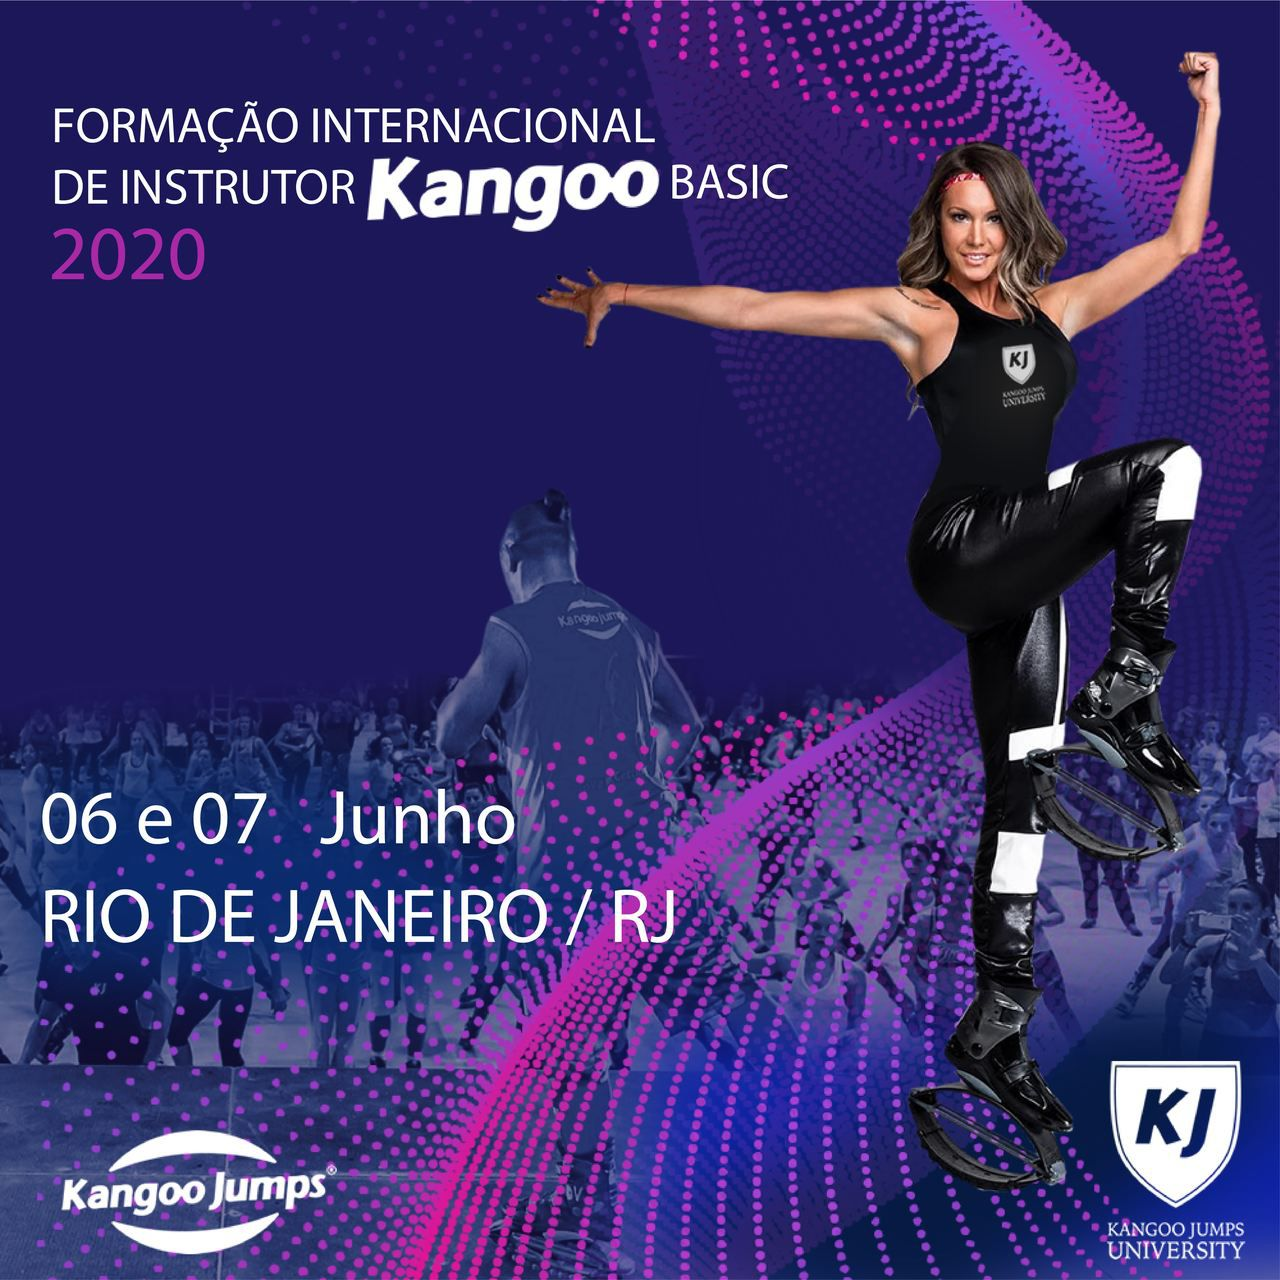 Kangoo Basic (Rio de janeiro - RJ)